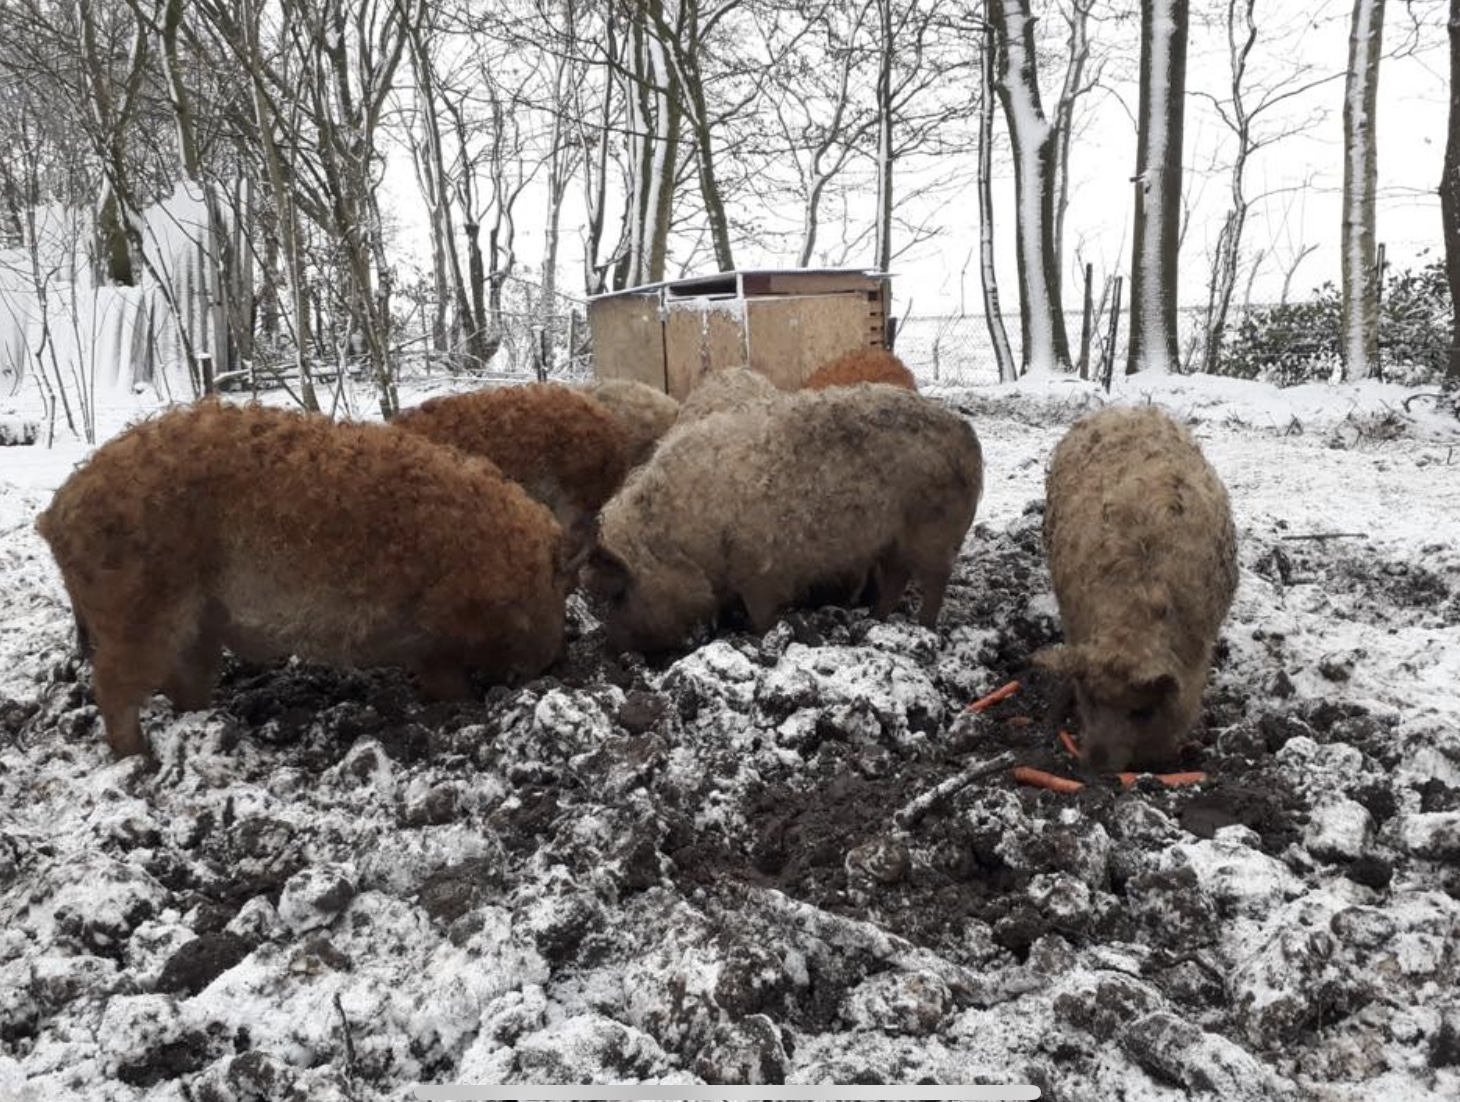 Snuyters in de sneeuw